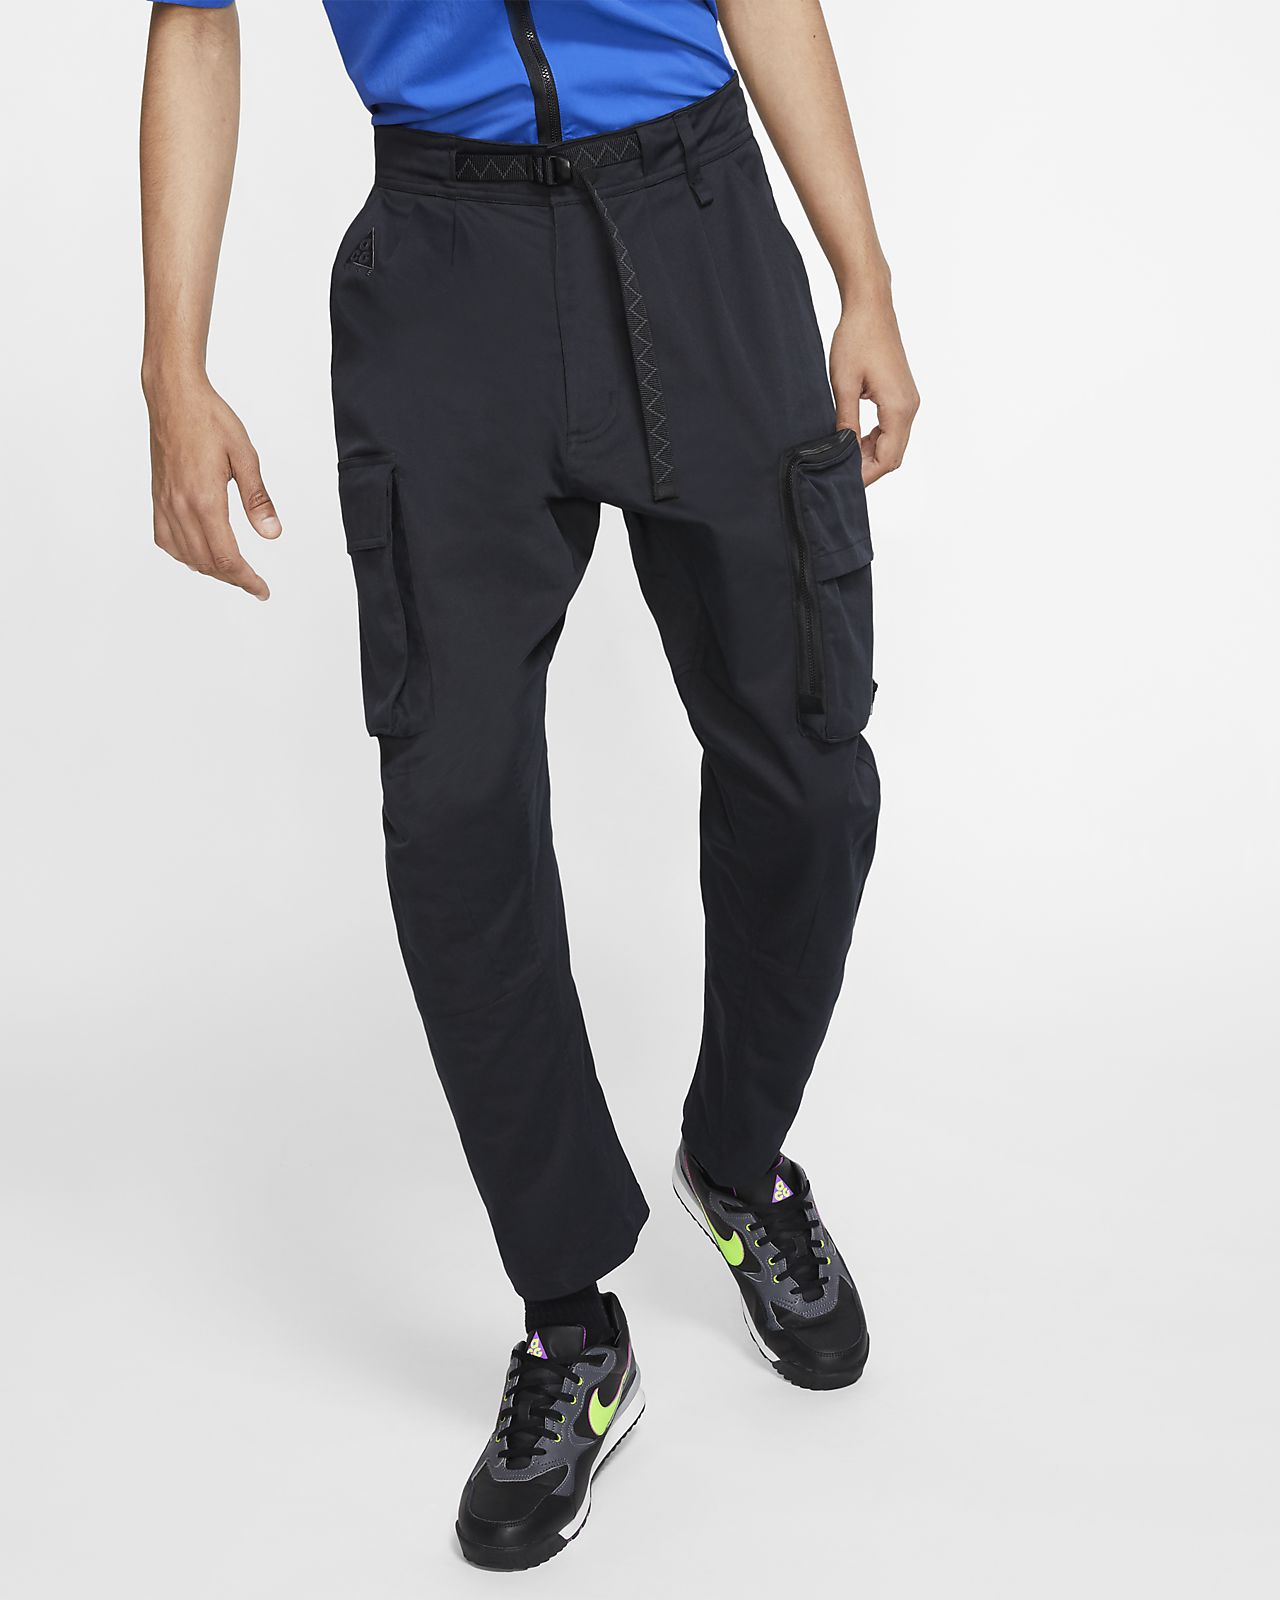 Nike ACG Men's Woven Cargo Trousers